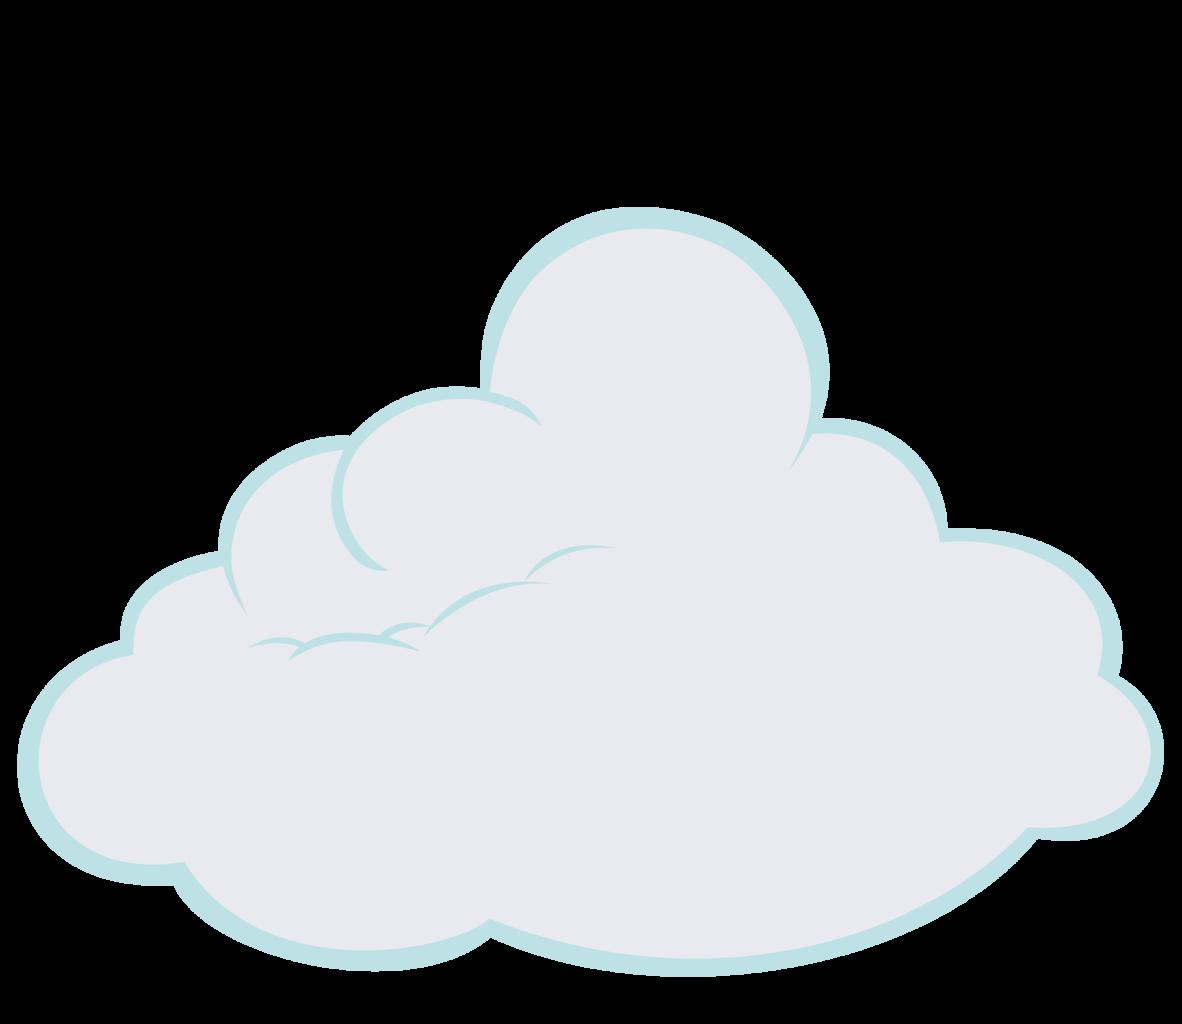 Cartoon clouds invisible background. Artist gurugrendo cloud